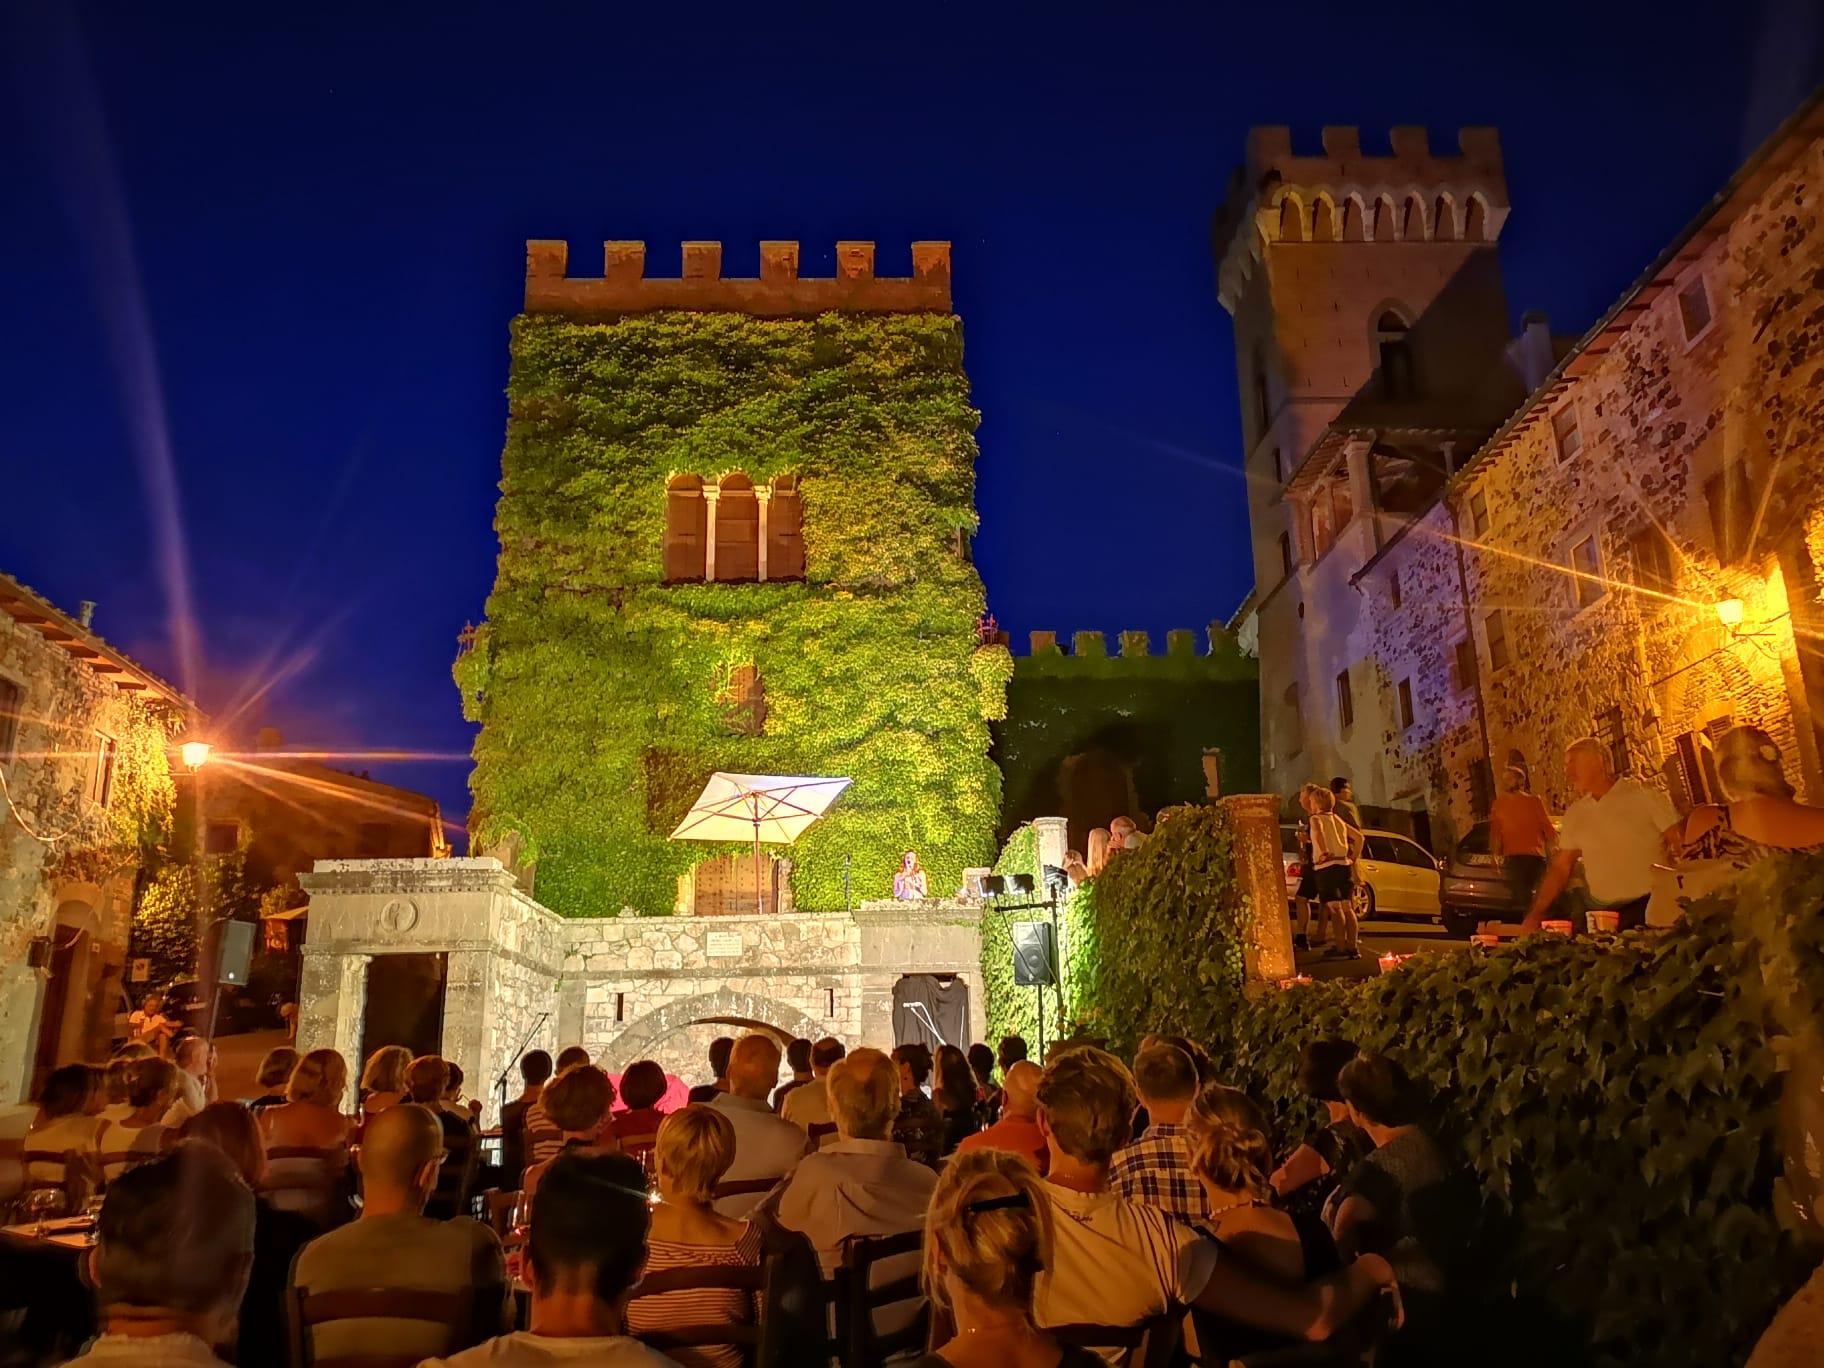 Querceto Art & Music Festival 2020